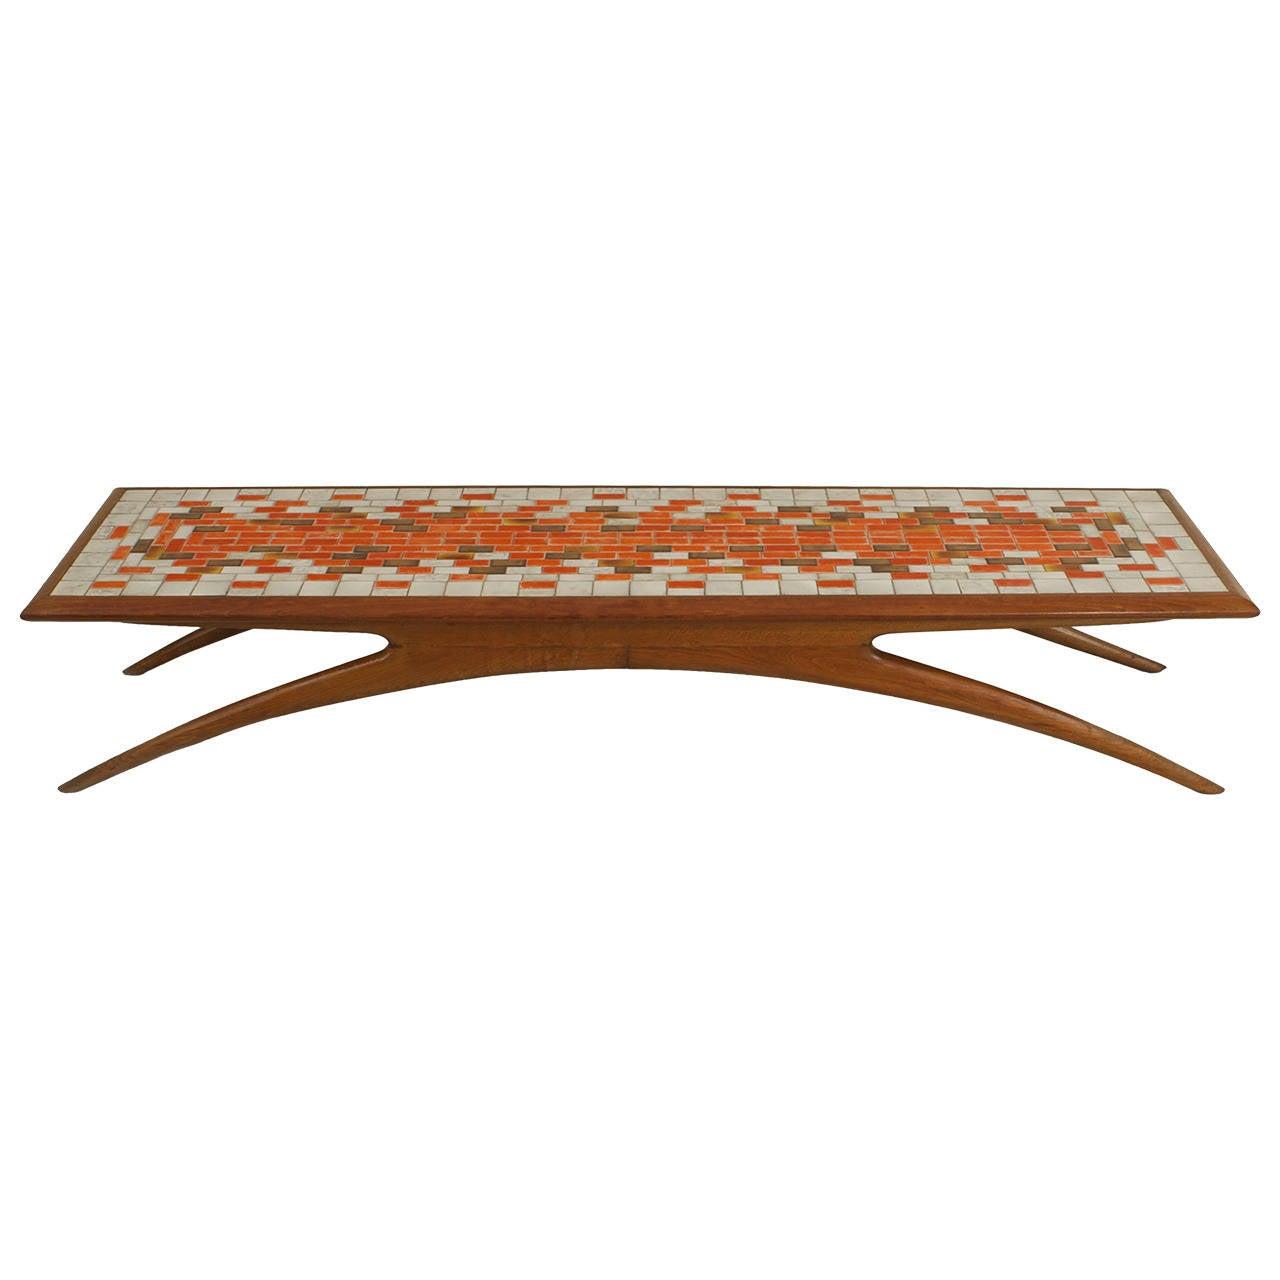 American Mosaic Top Fruitwood Coffee Table By Vladimir